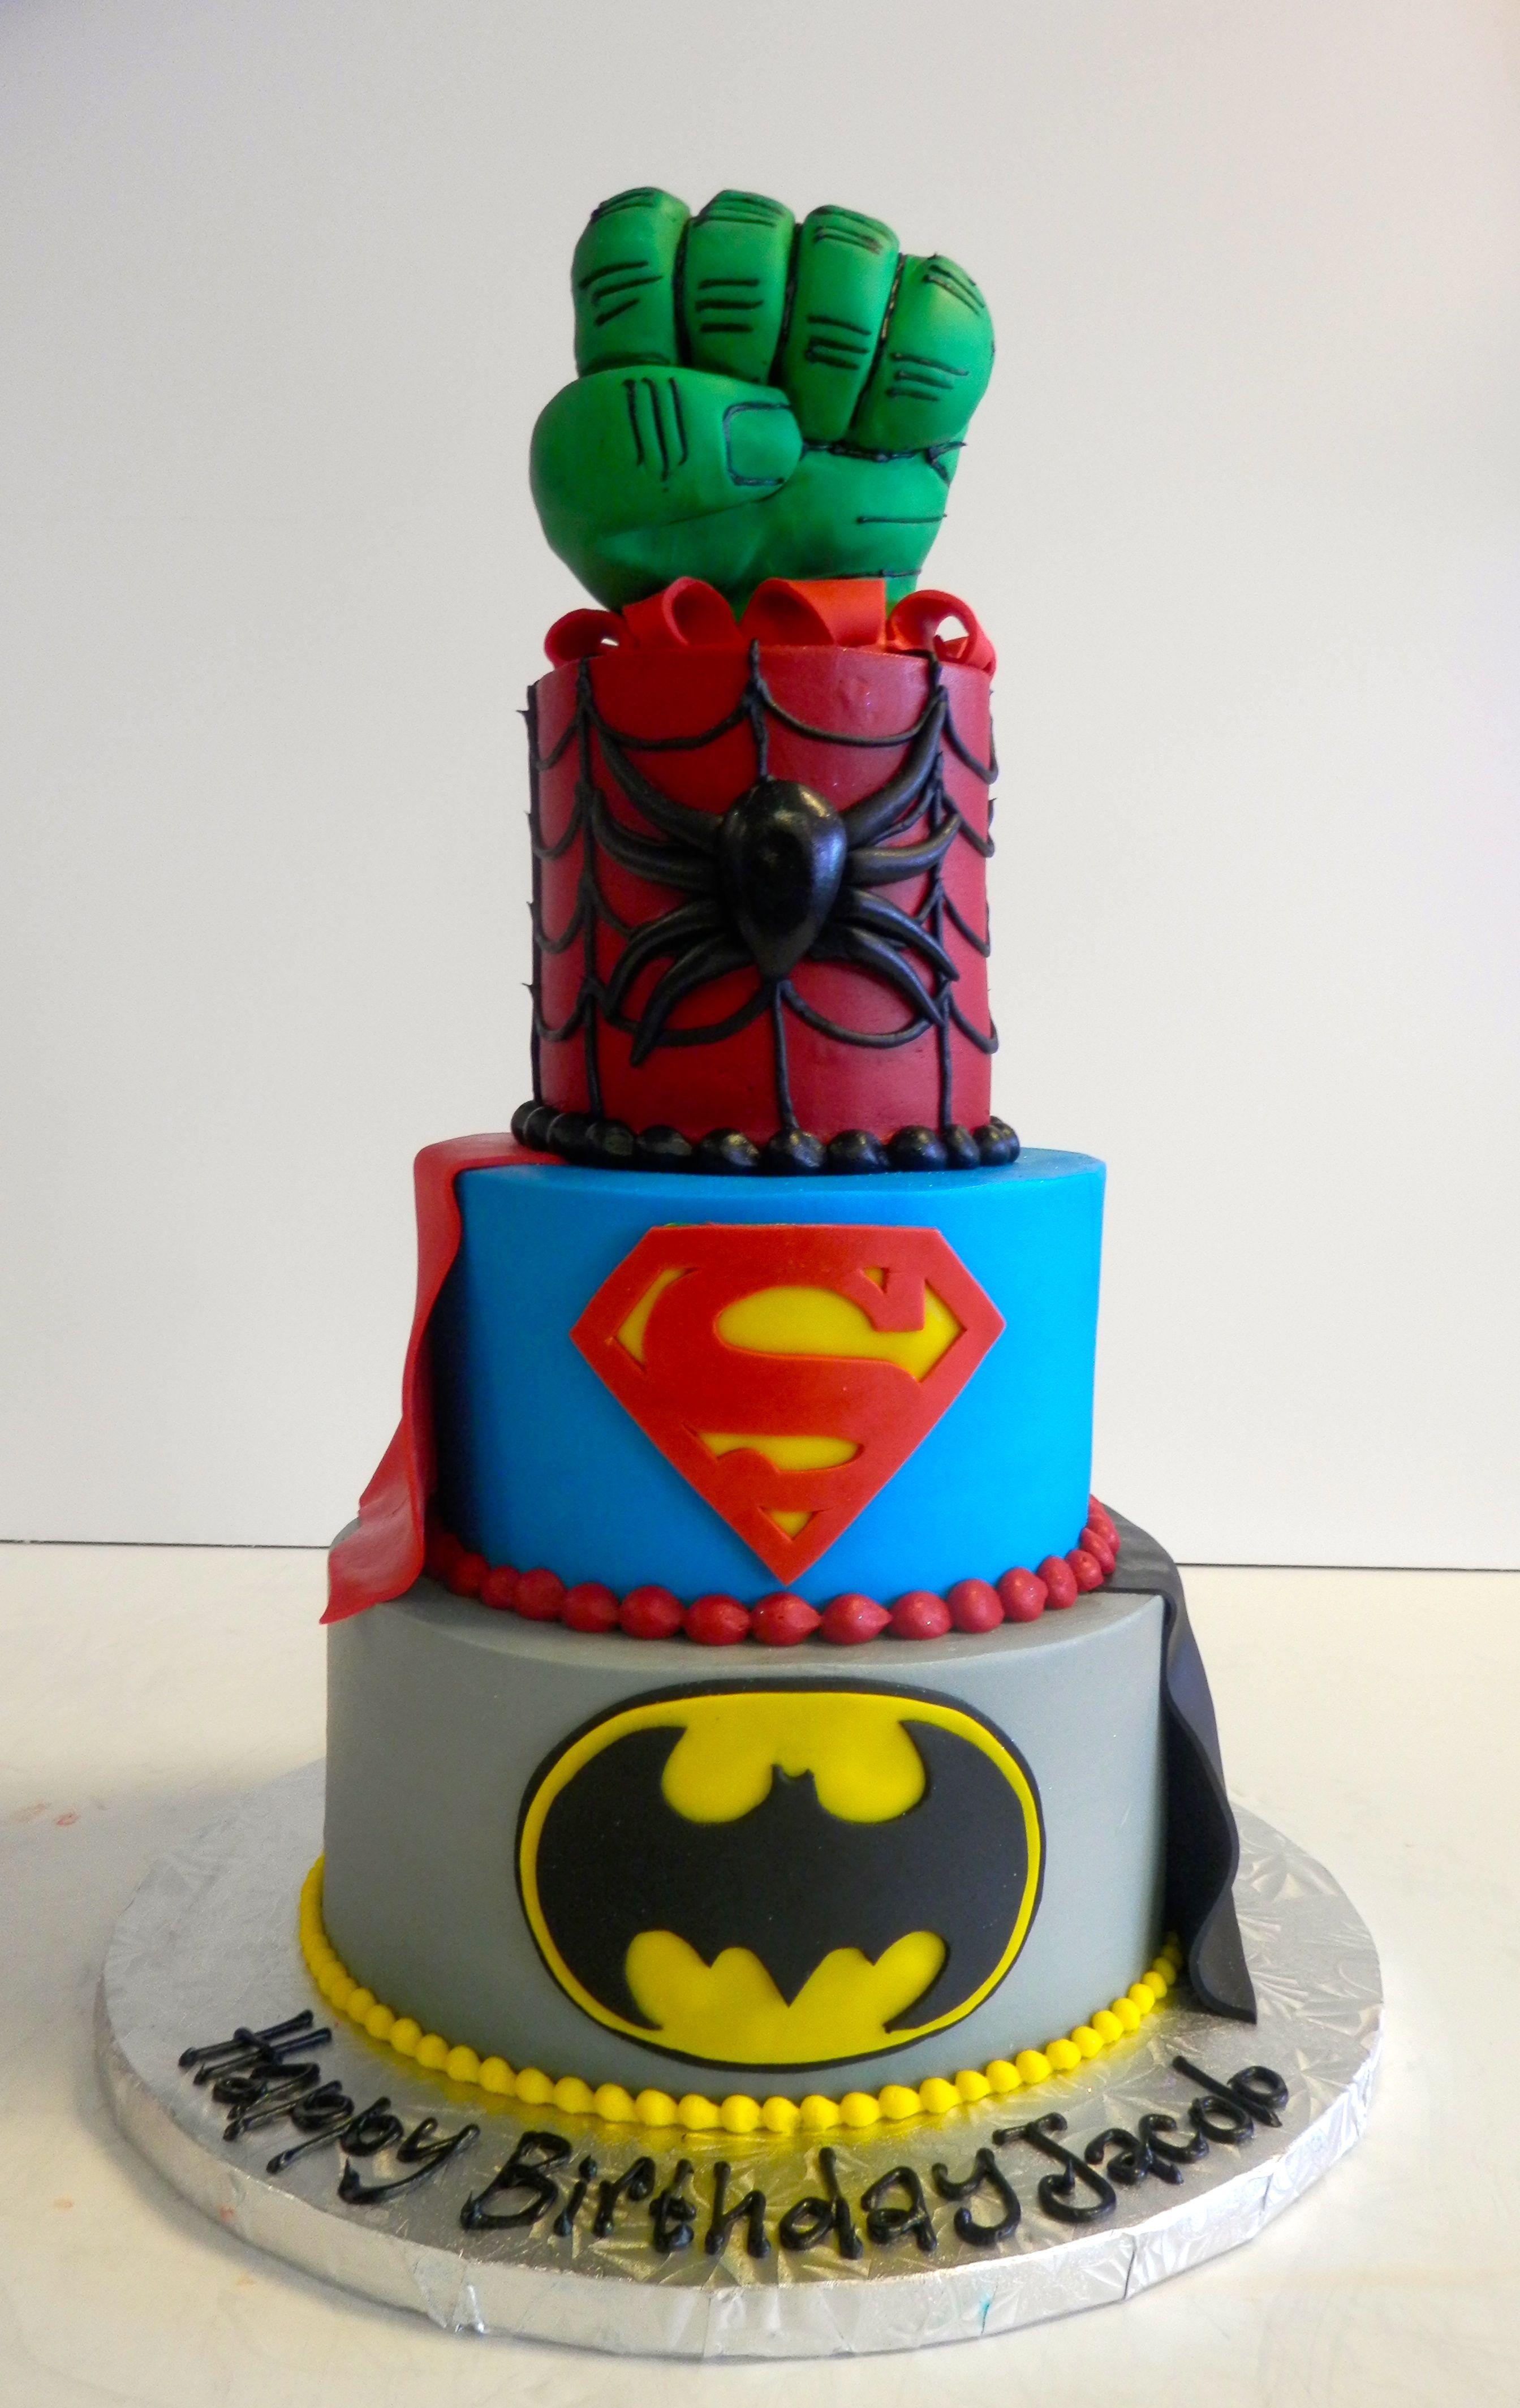 Superhero Cake From Sweet Treets Bakery Spiderman Hulk Batman